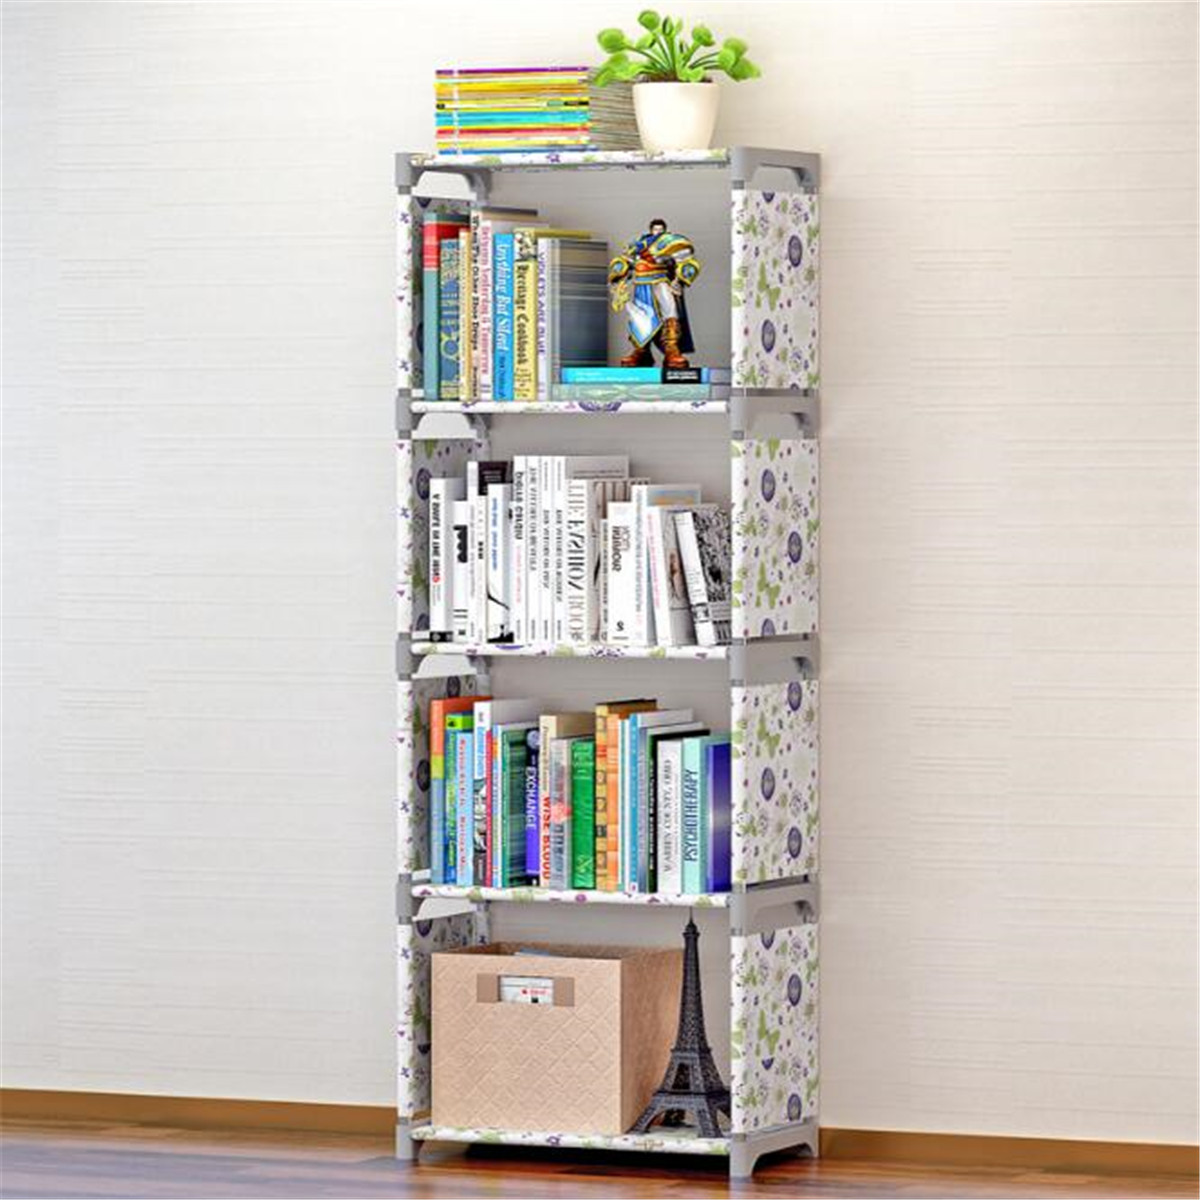 new concept 7fea5 f9733 US $23.59 34% OFF|DIY Combination Shelf Floor Standing Children Bookcase  Simple Bookshelf Book Storage Shelf For Books Plants Sundries Furniture-in  ...